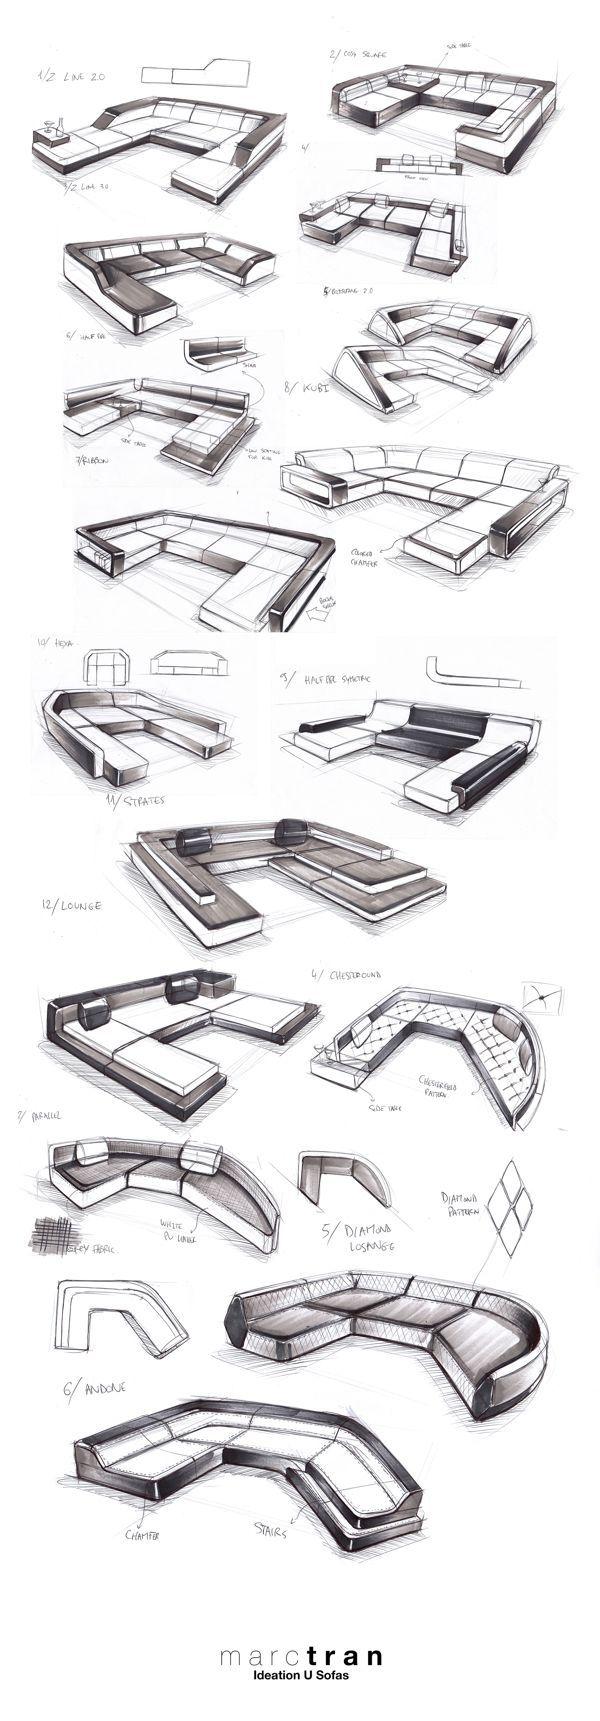 Puiforcat Zermatt cutlery, stainless steel | Artedona.com